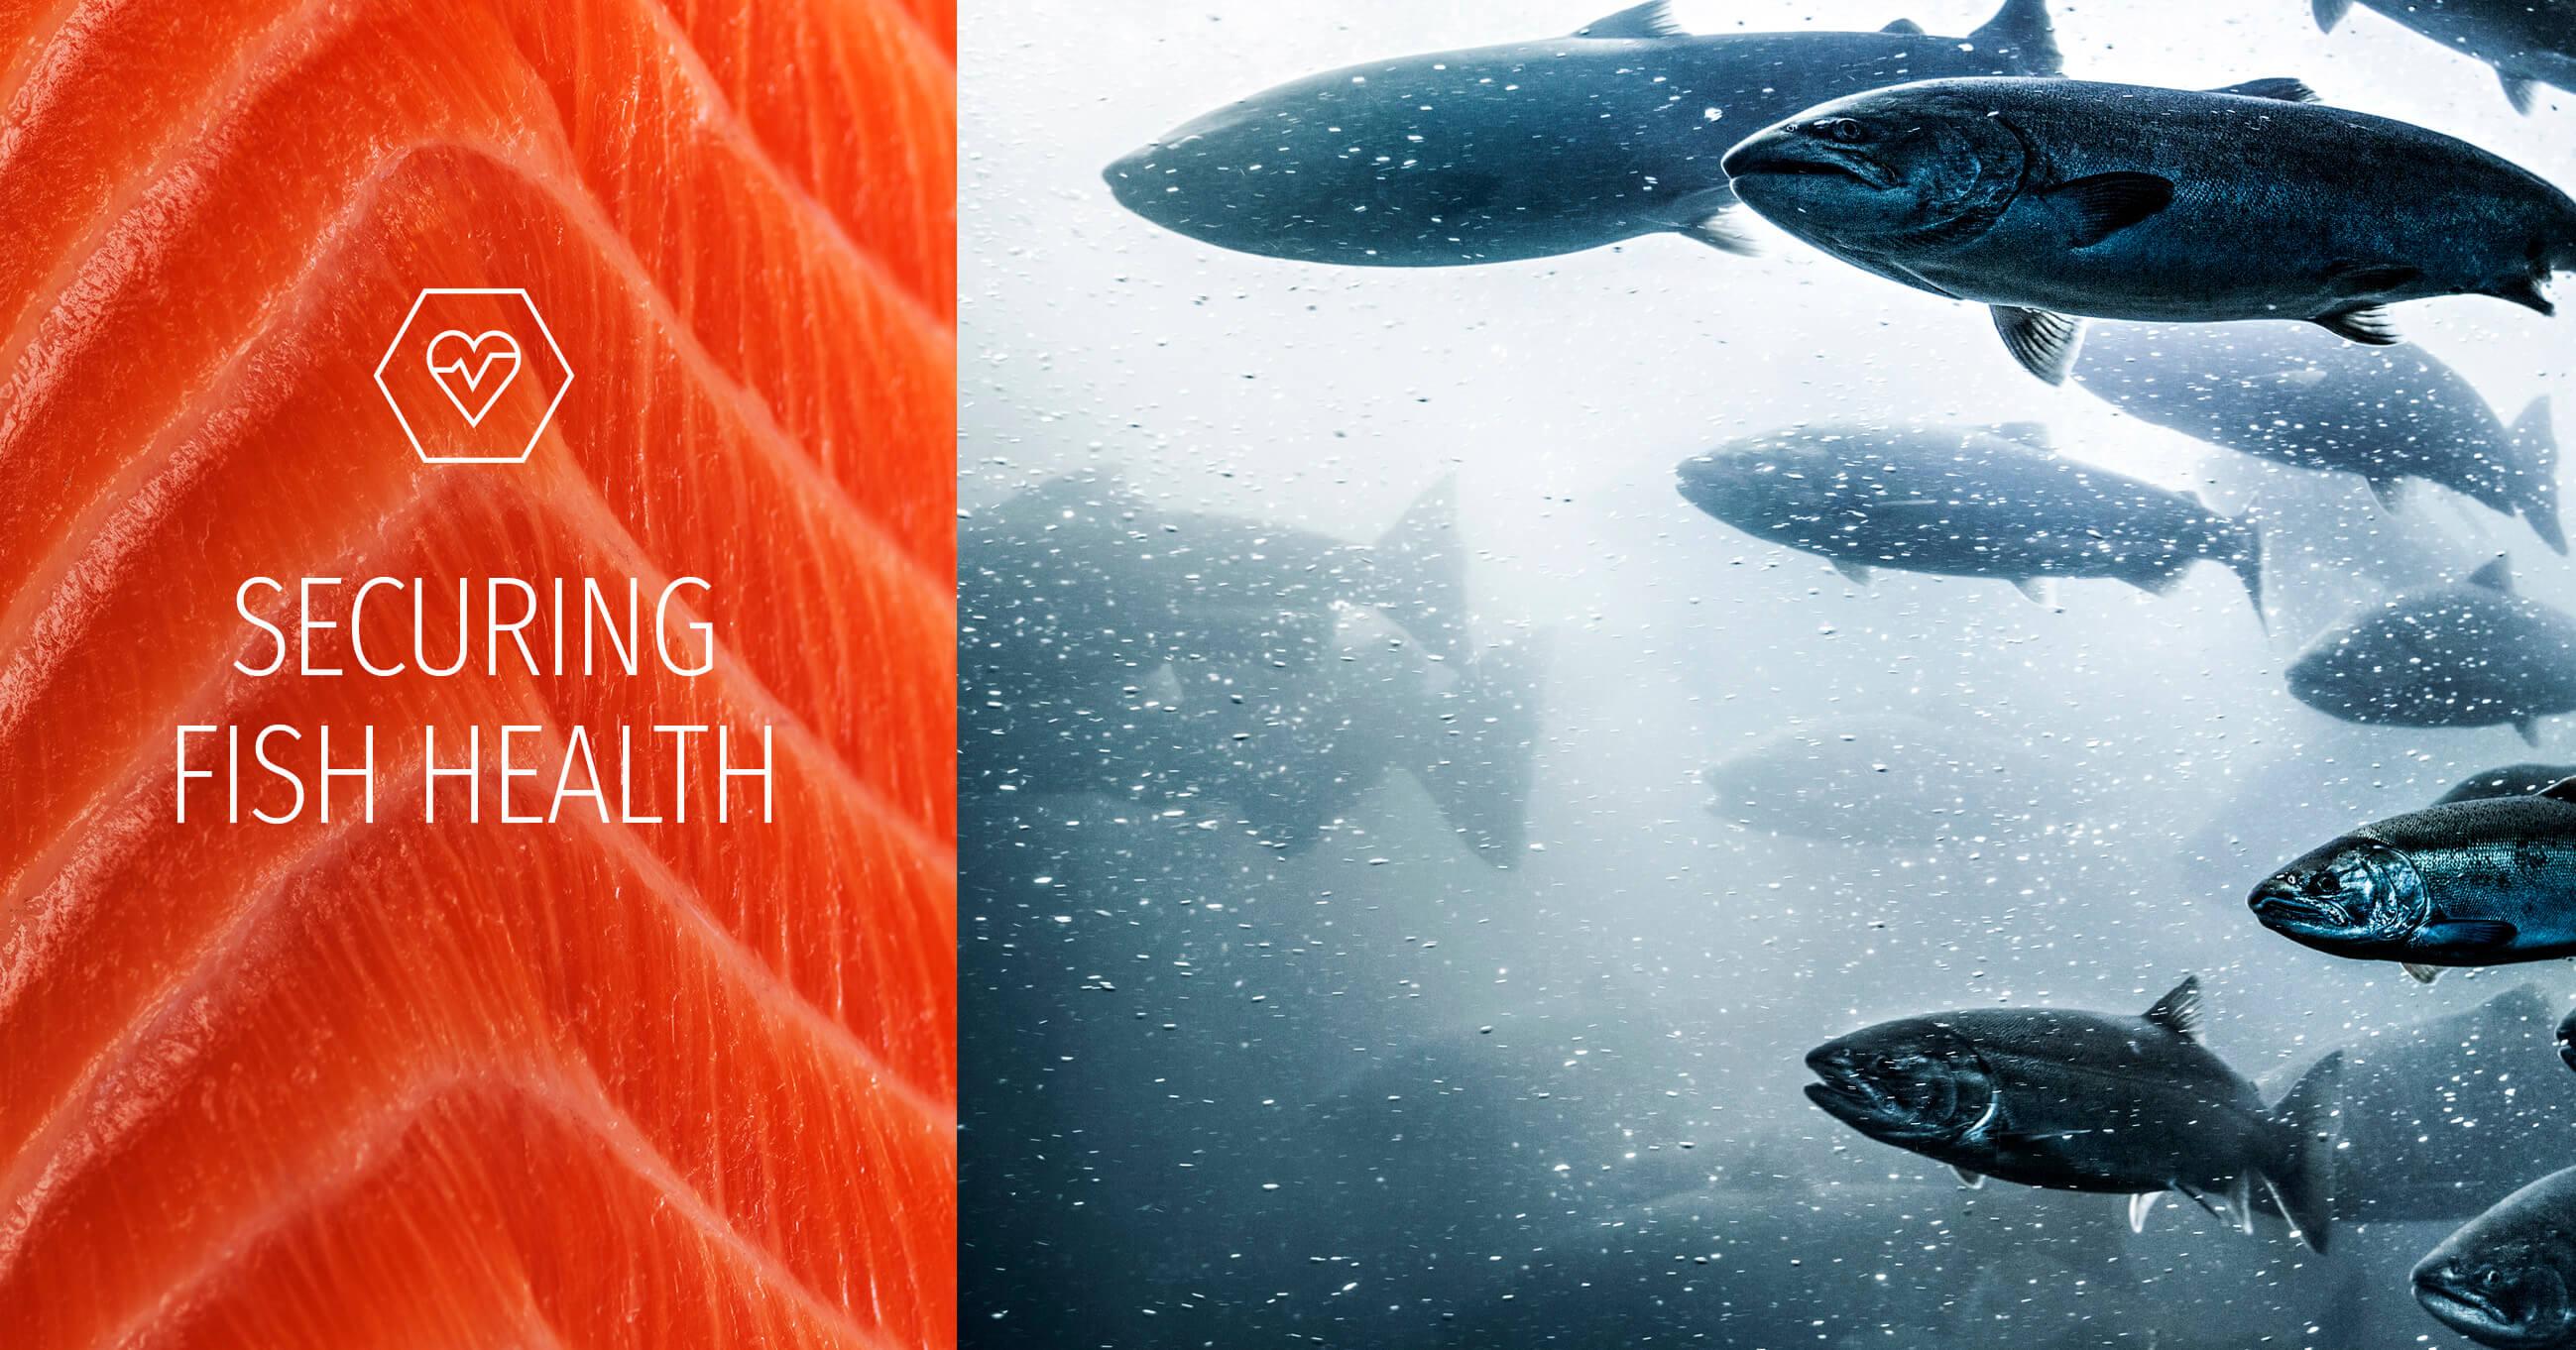 Qrill aqua for fish health and reduced mortality